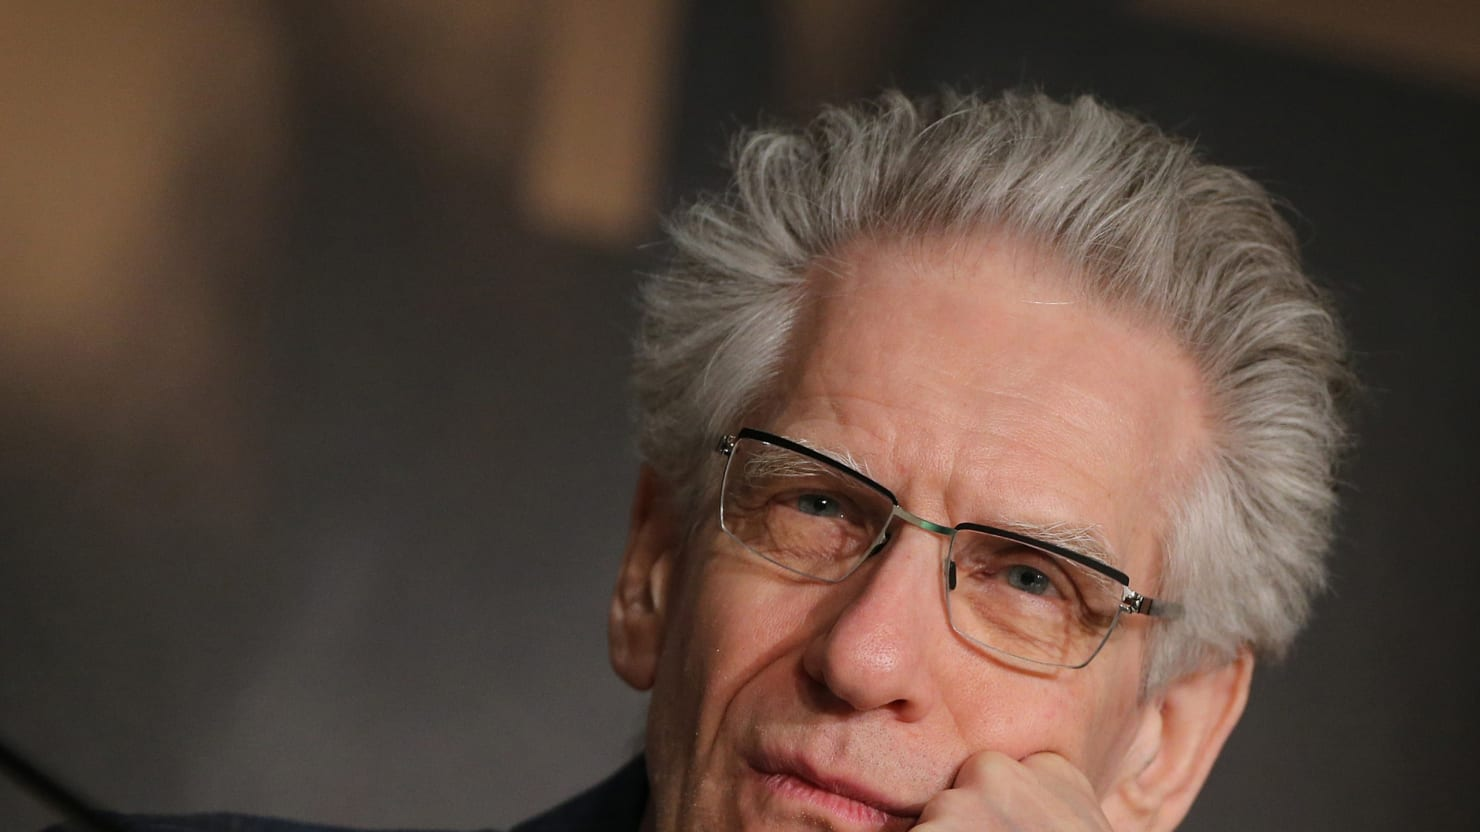 David Cronenberg - film director, screenwriter. The best films of David Cronenberg 16